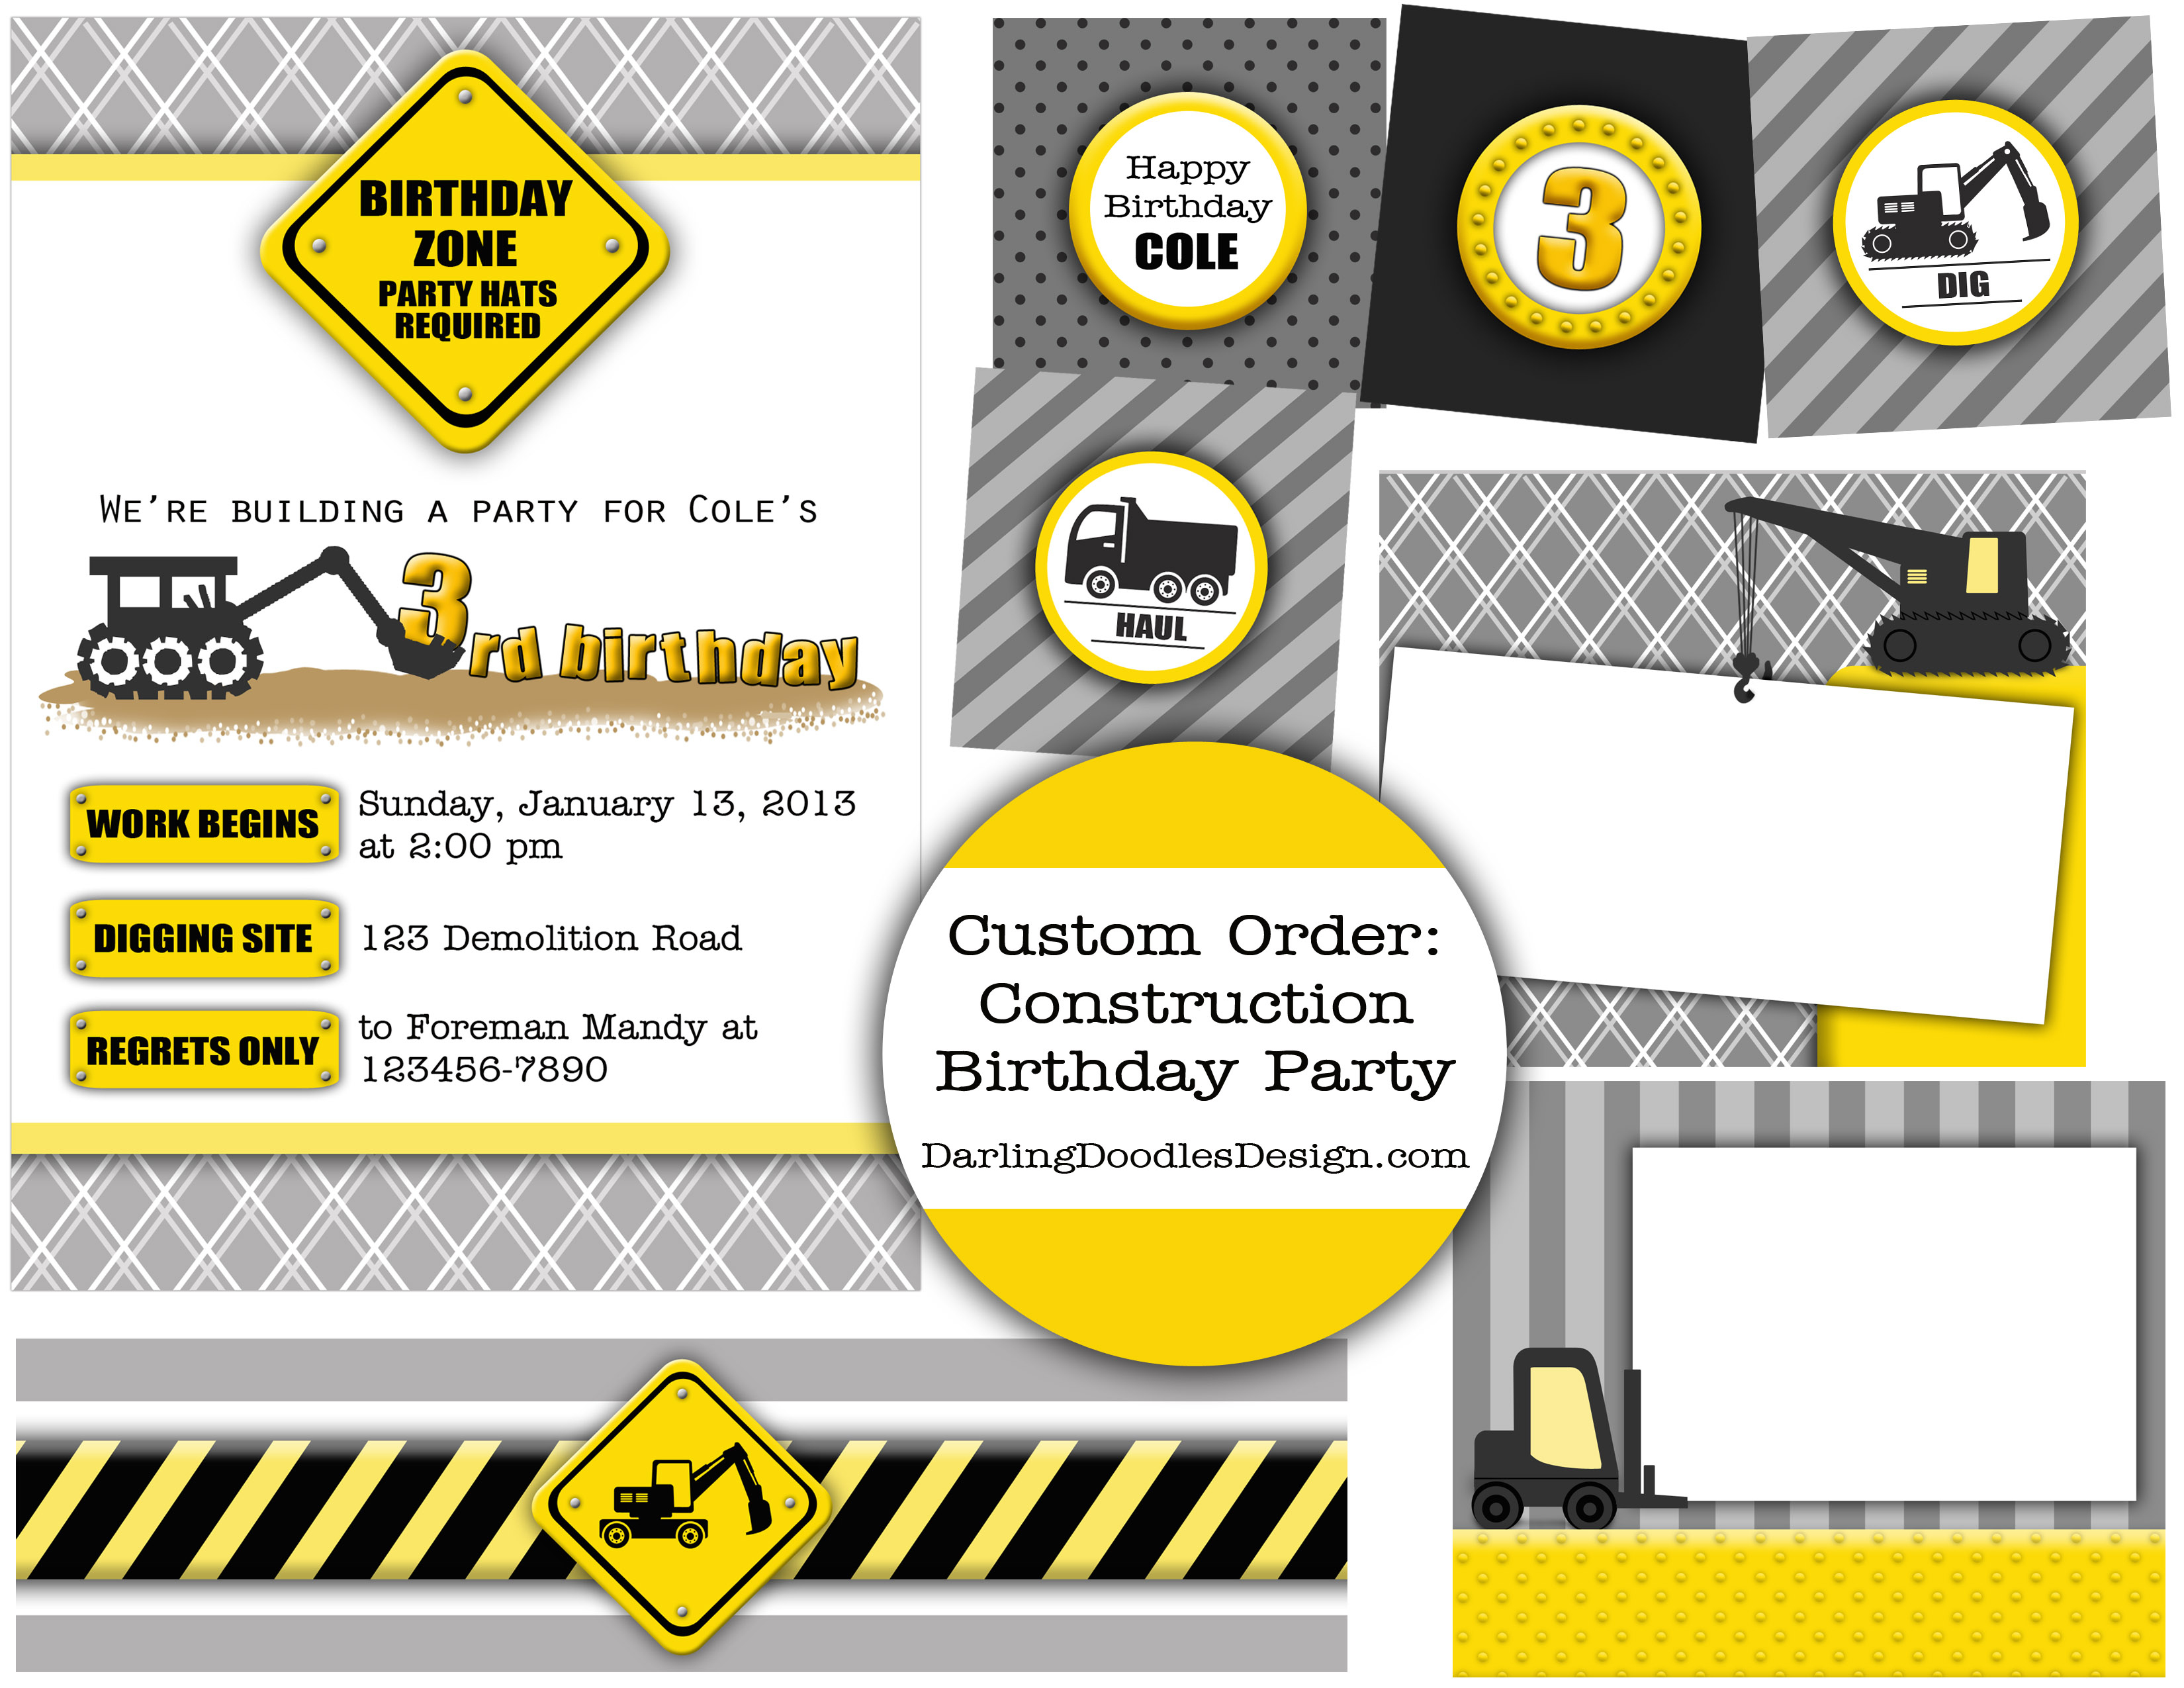 Dafafcbbaaaededc Spectacular Construction Birthday Invitations Free - Free Printable Construction Invitations